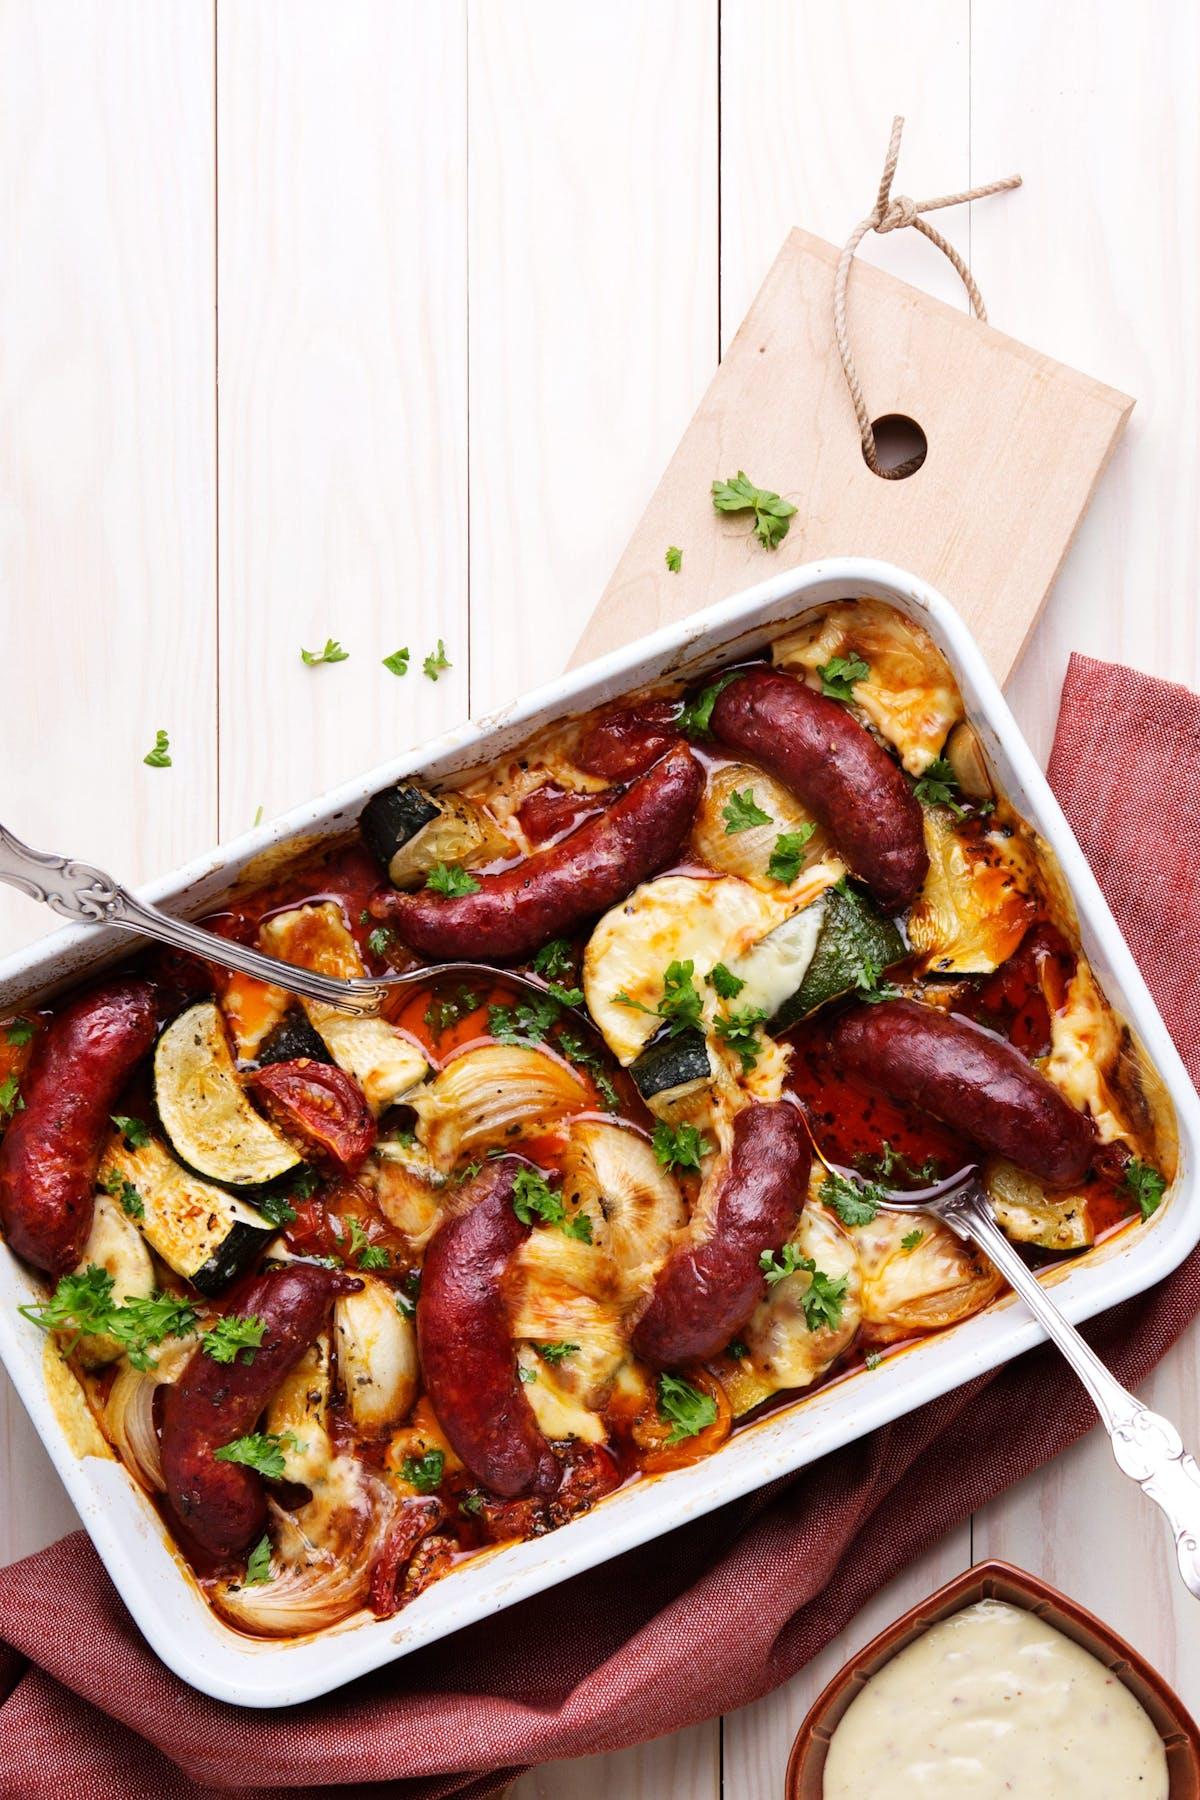 Salchichas al horno con verduras